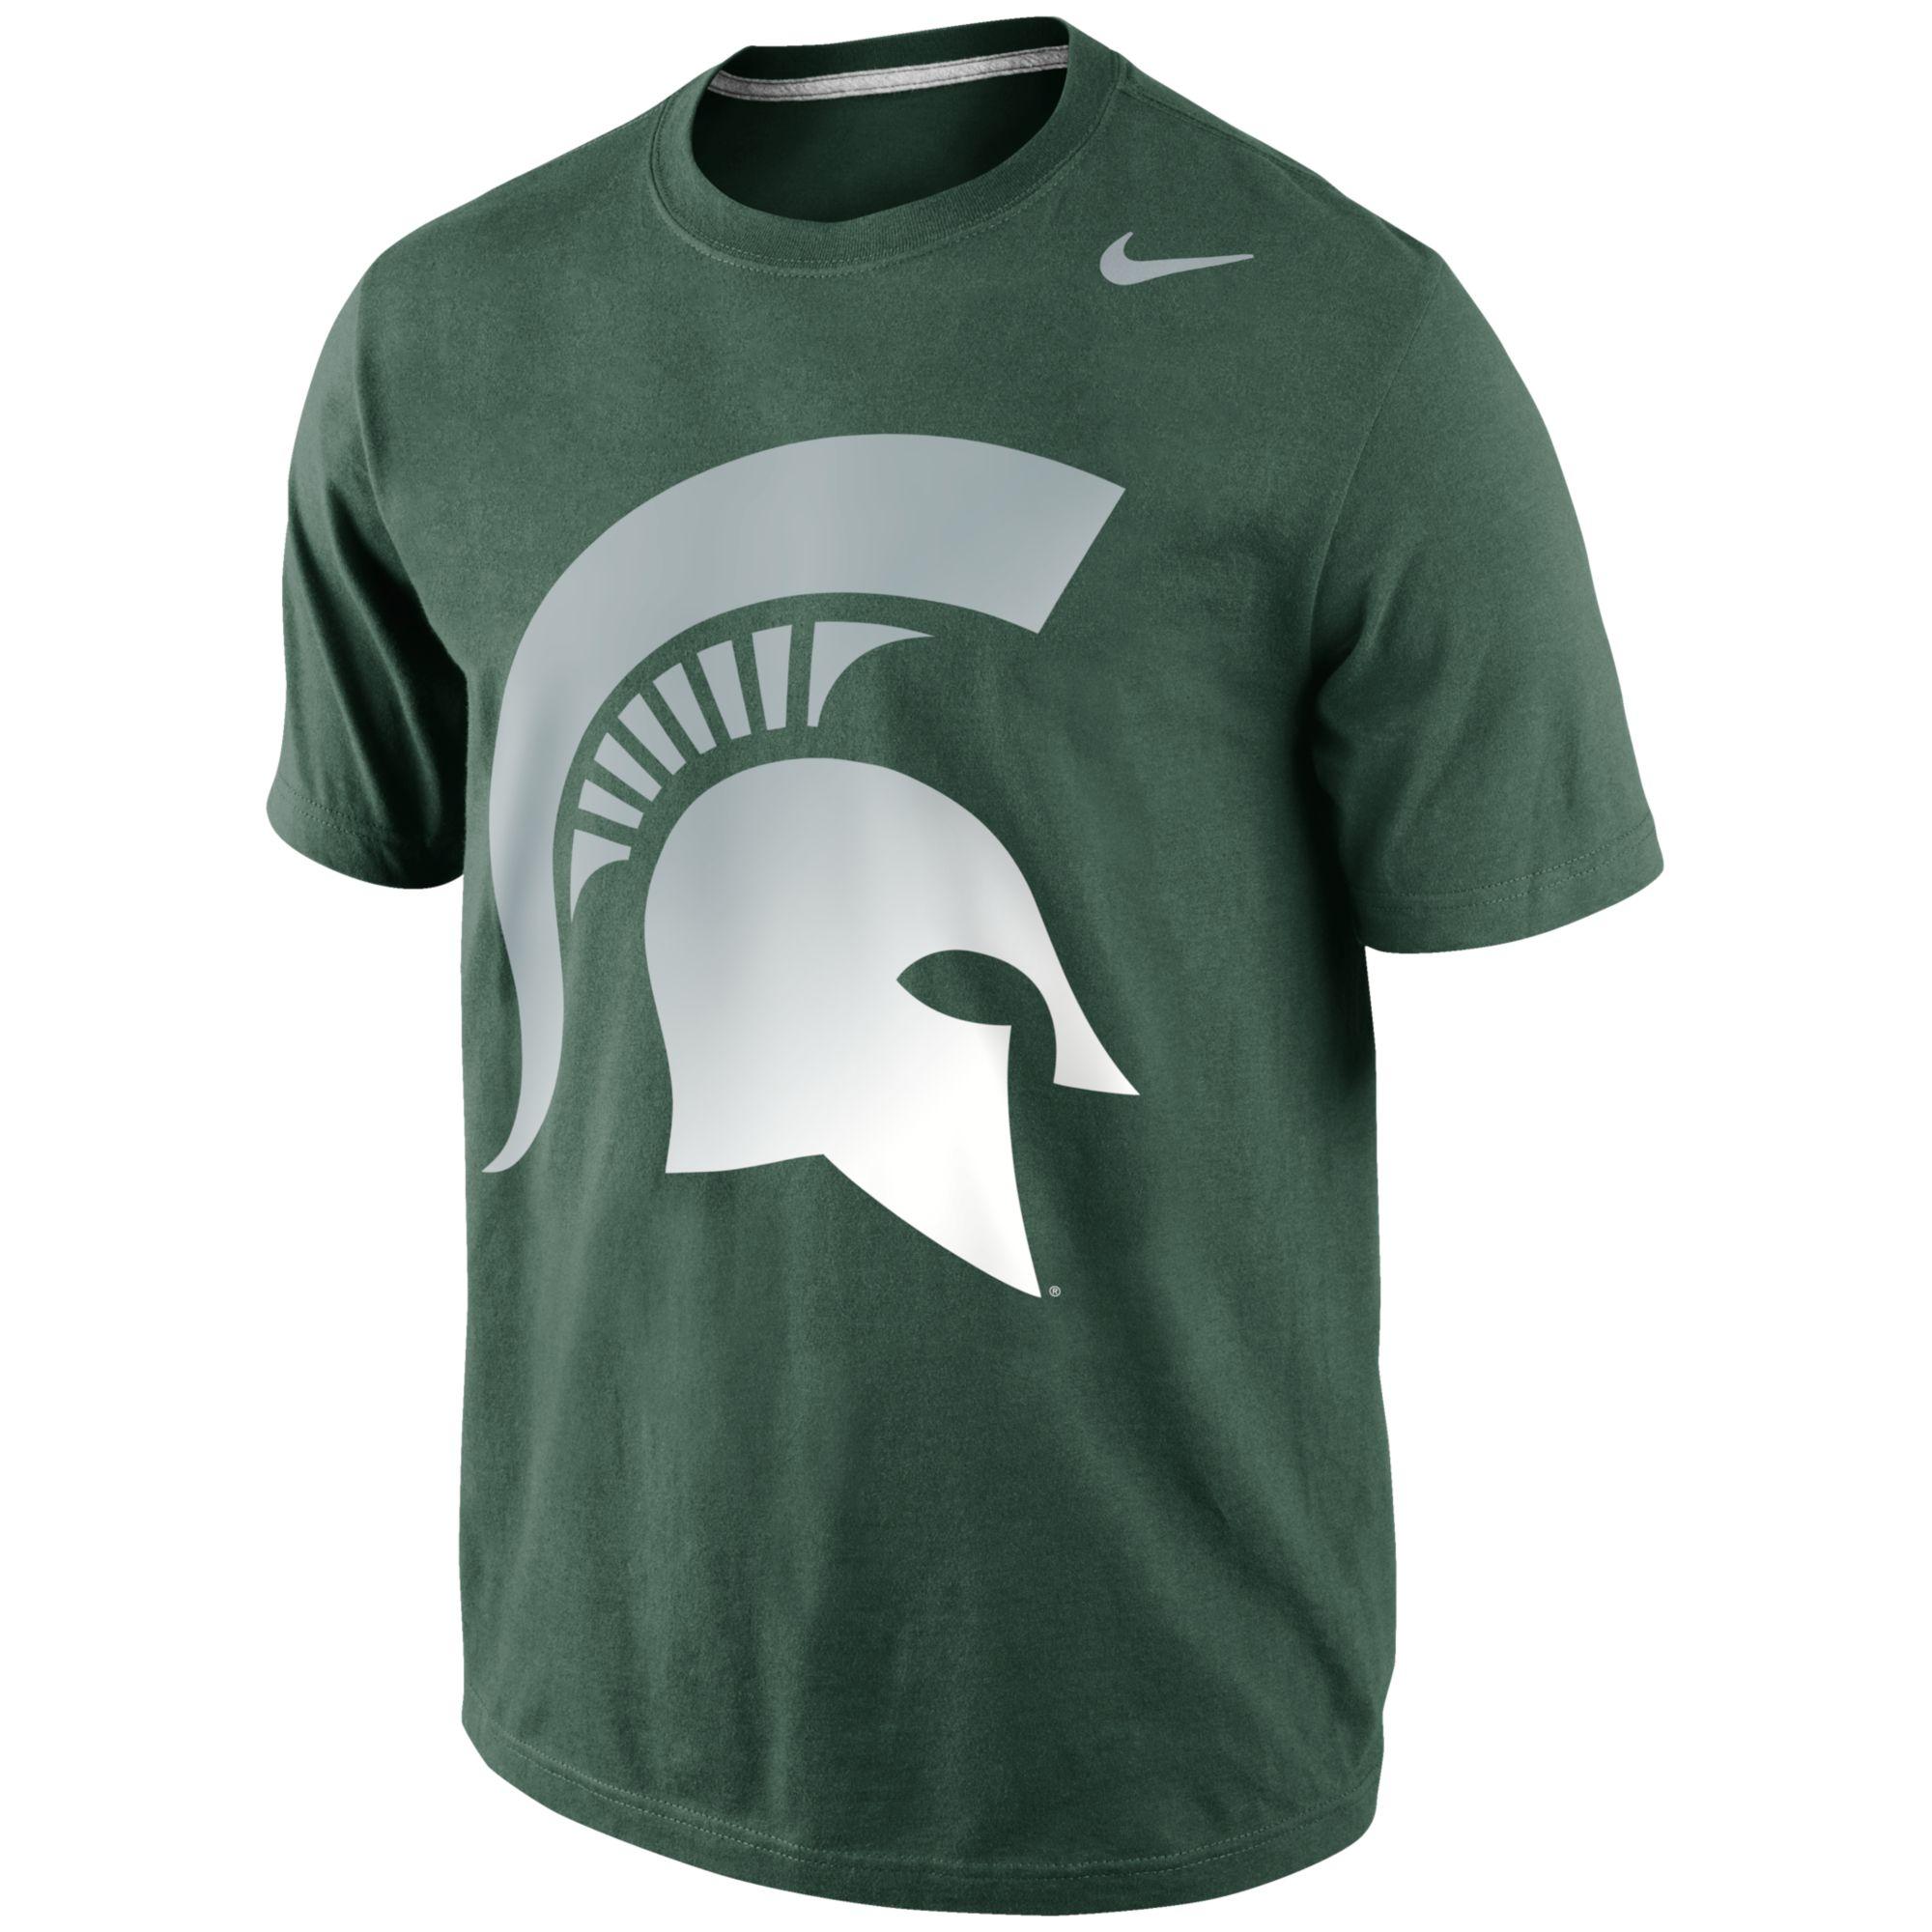 Nike mens michigan state spartans gradient tshirt in green for Michigan state spartans t shirts